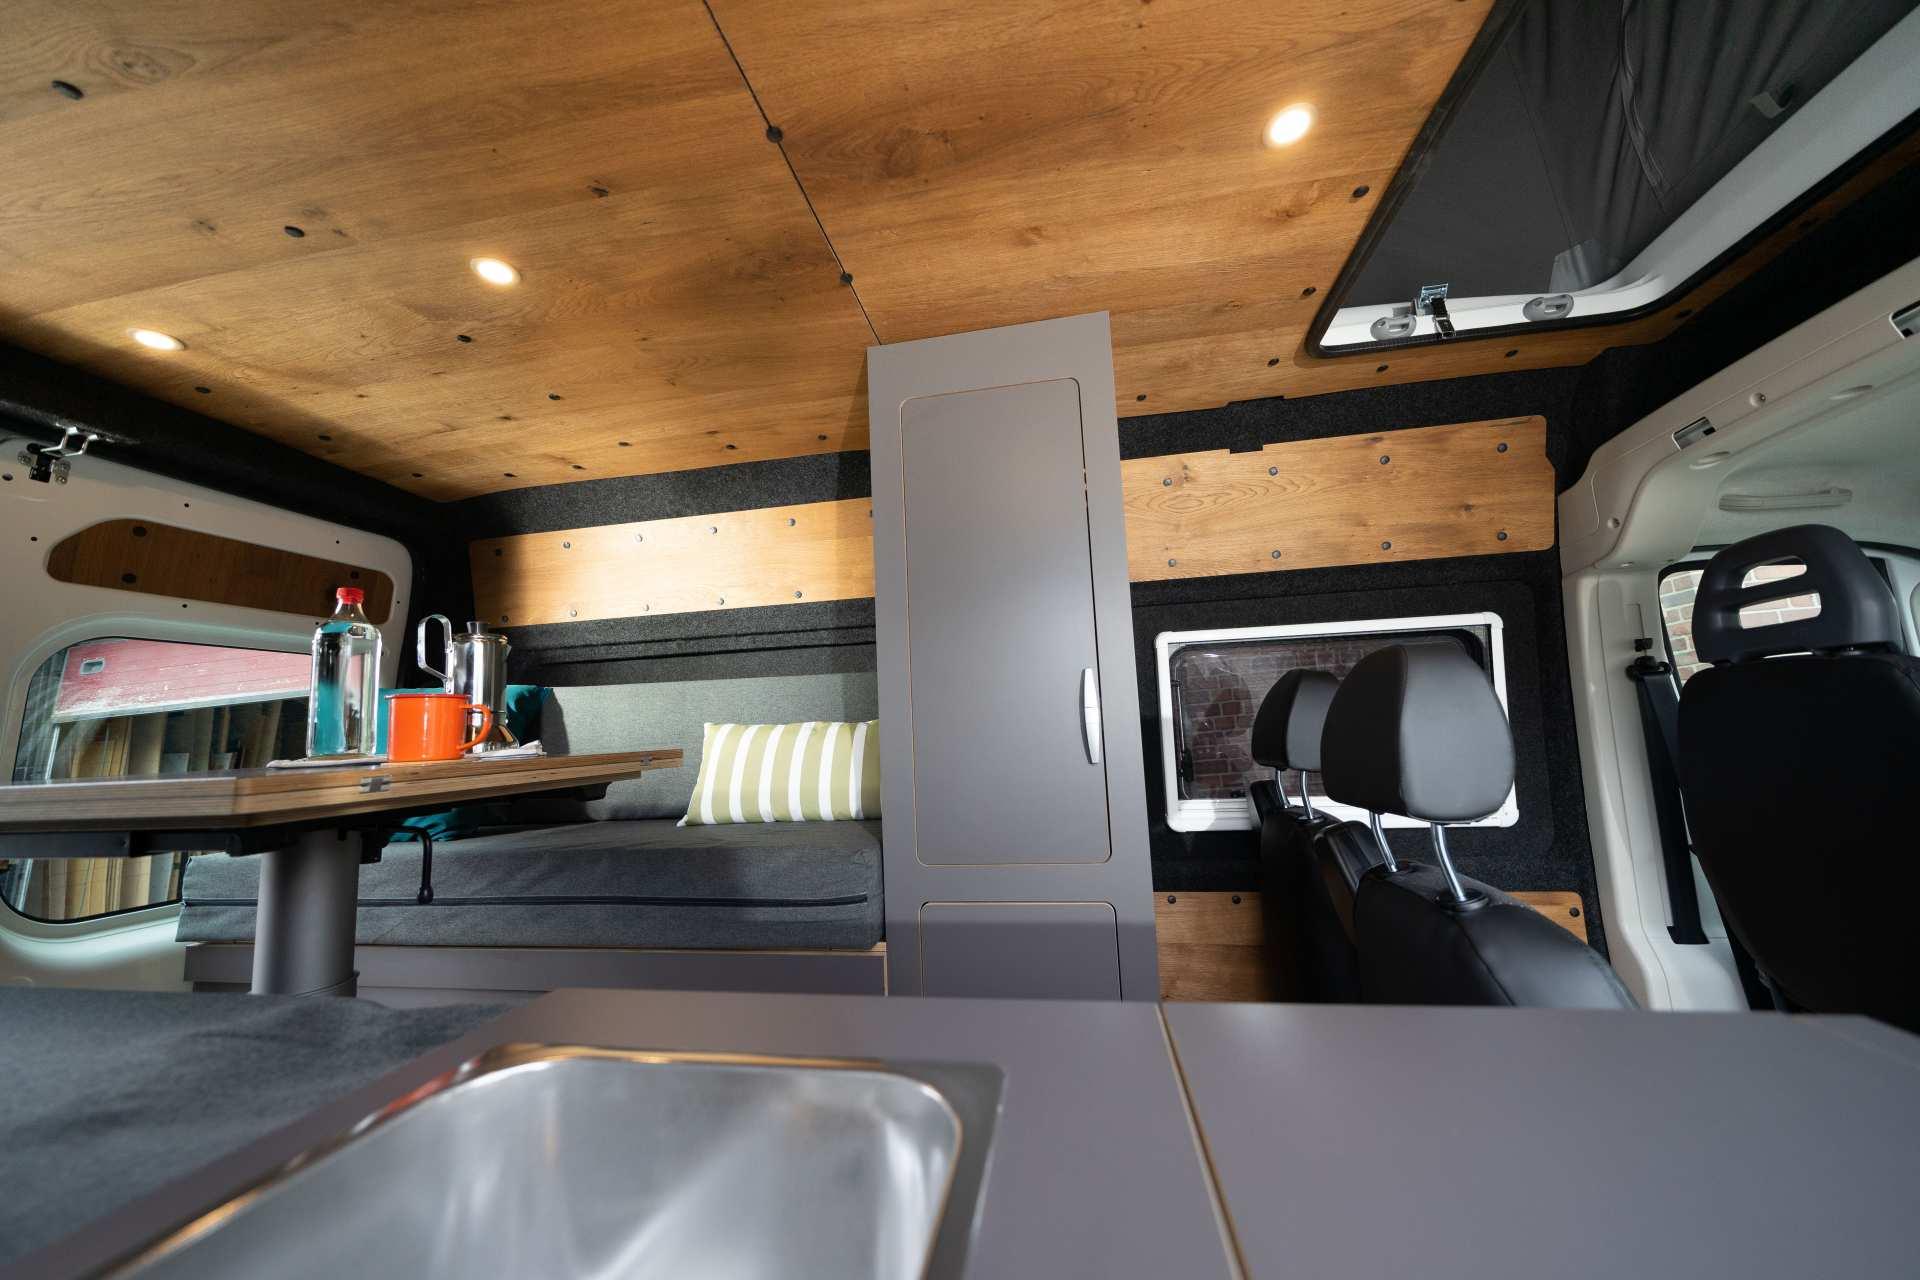 Individualausbau: Zwei-Raumwohnung Peugeot Boxer L2 H2 - 33